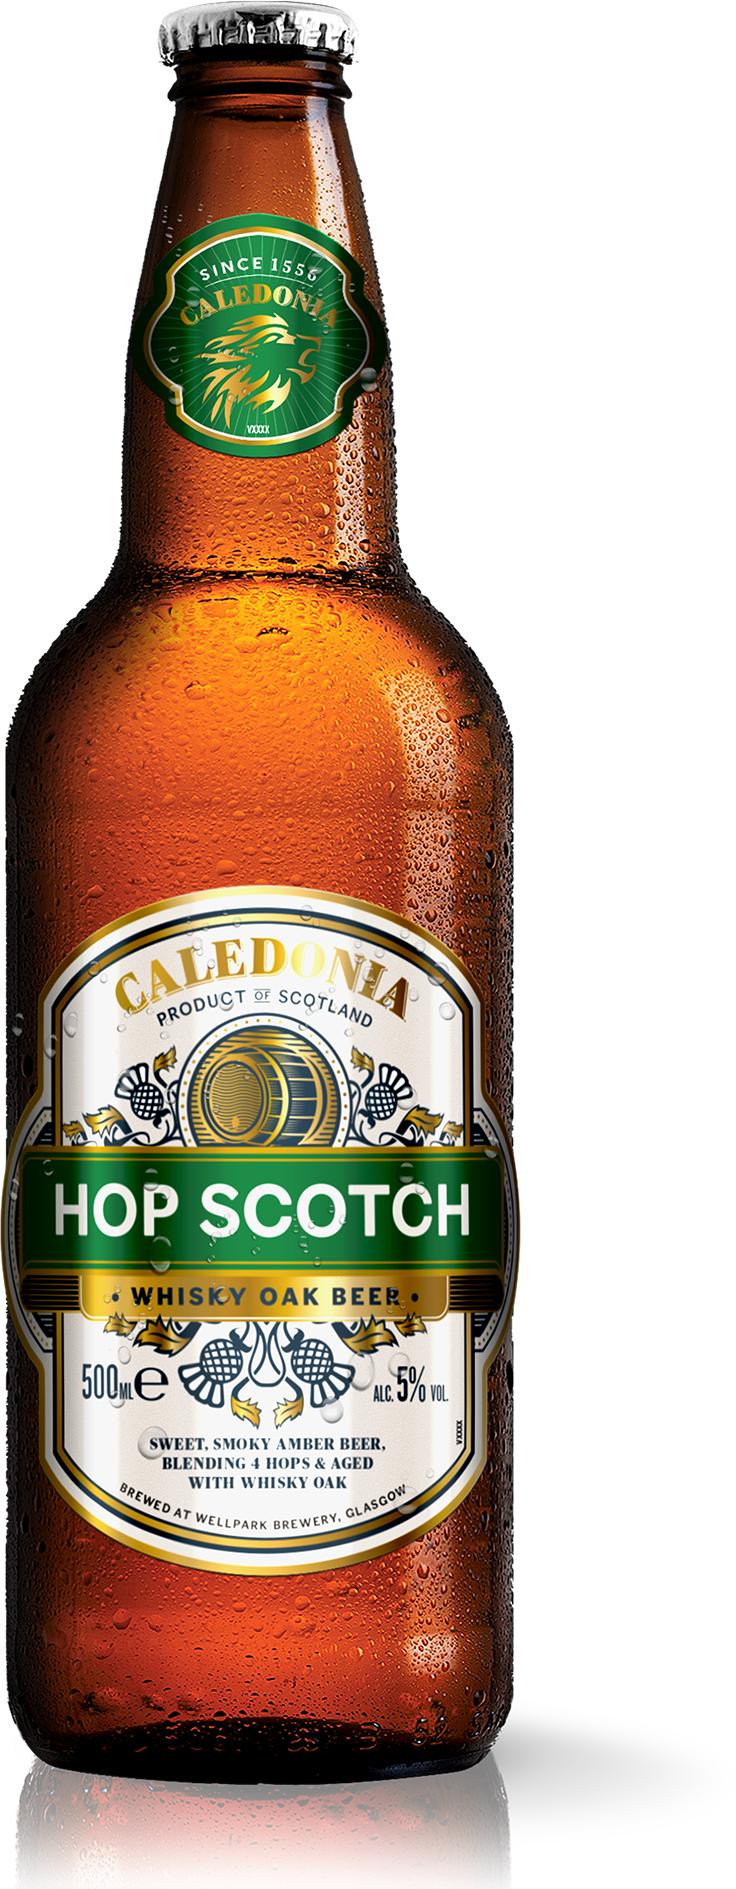 Caledonia Hop Scotch Ale @ 99p Home Bargains (In-store)